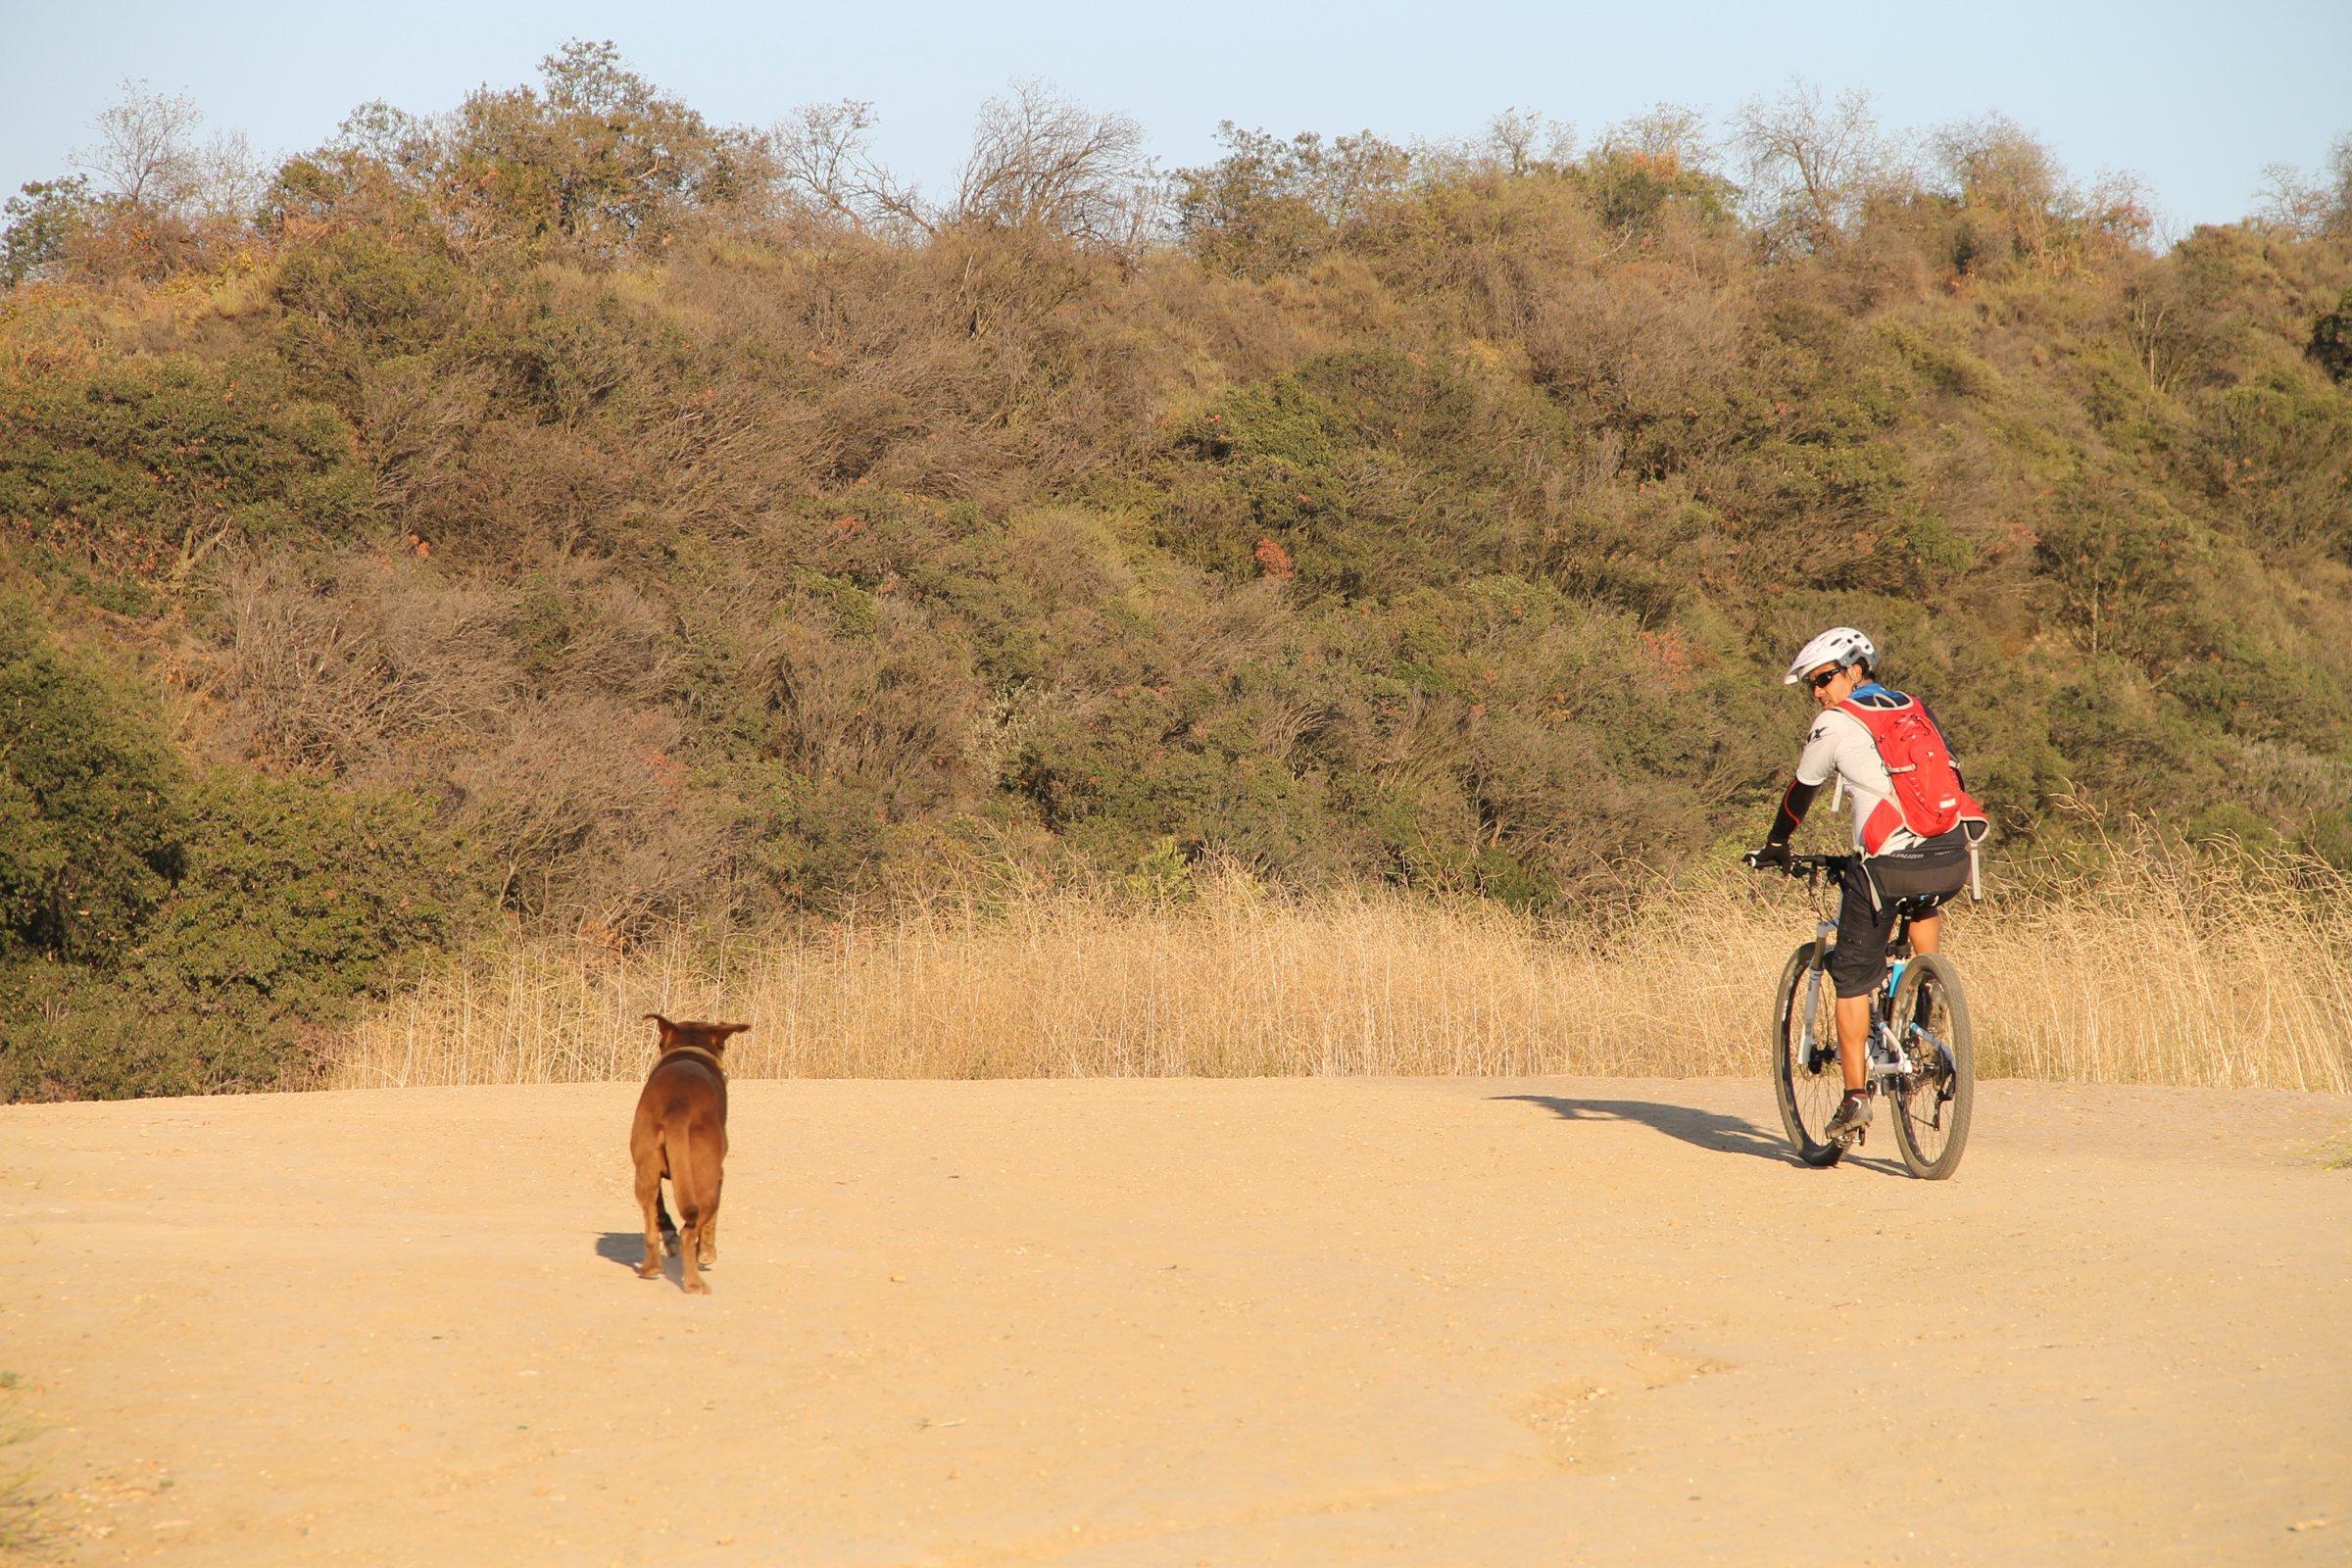 Cyclist Riding Next to Dog